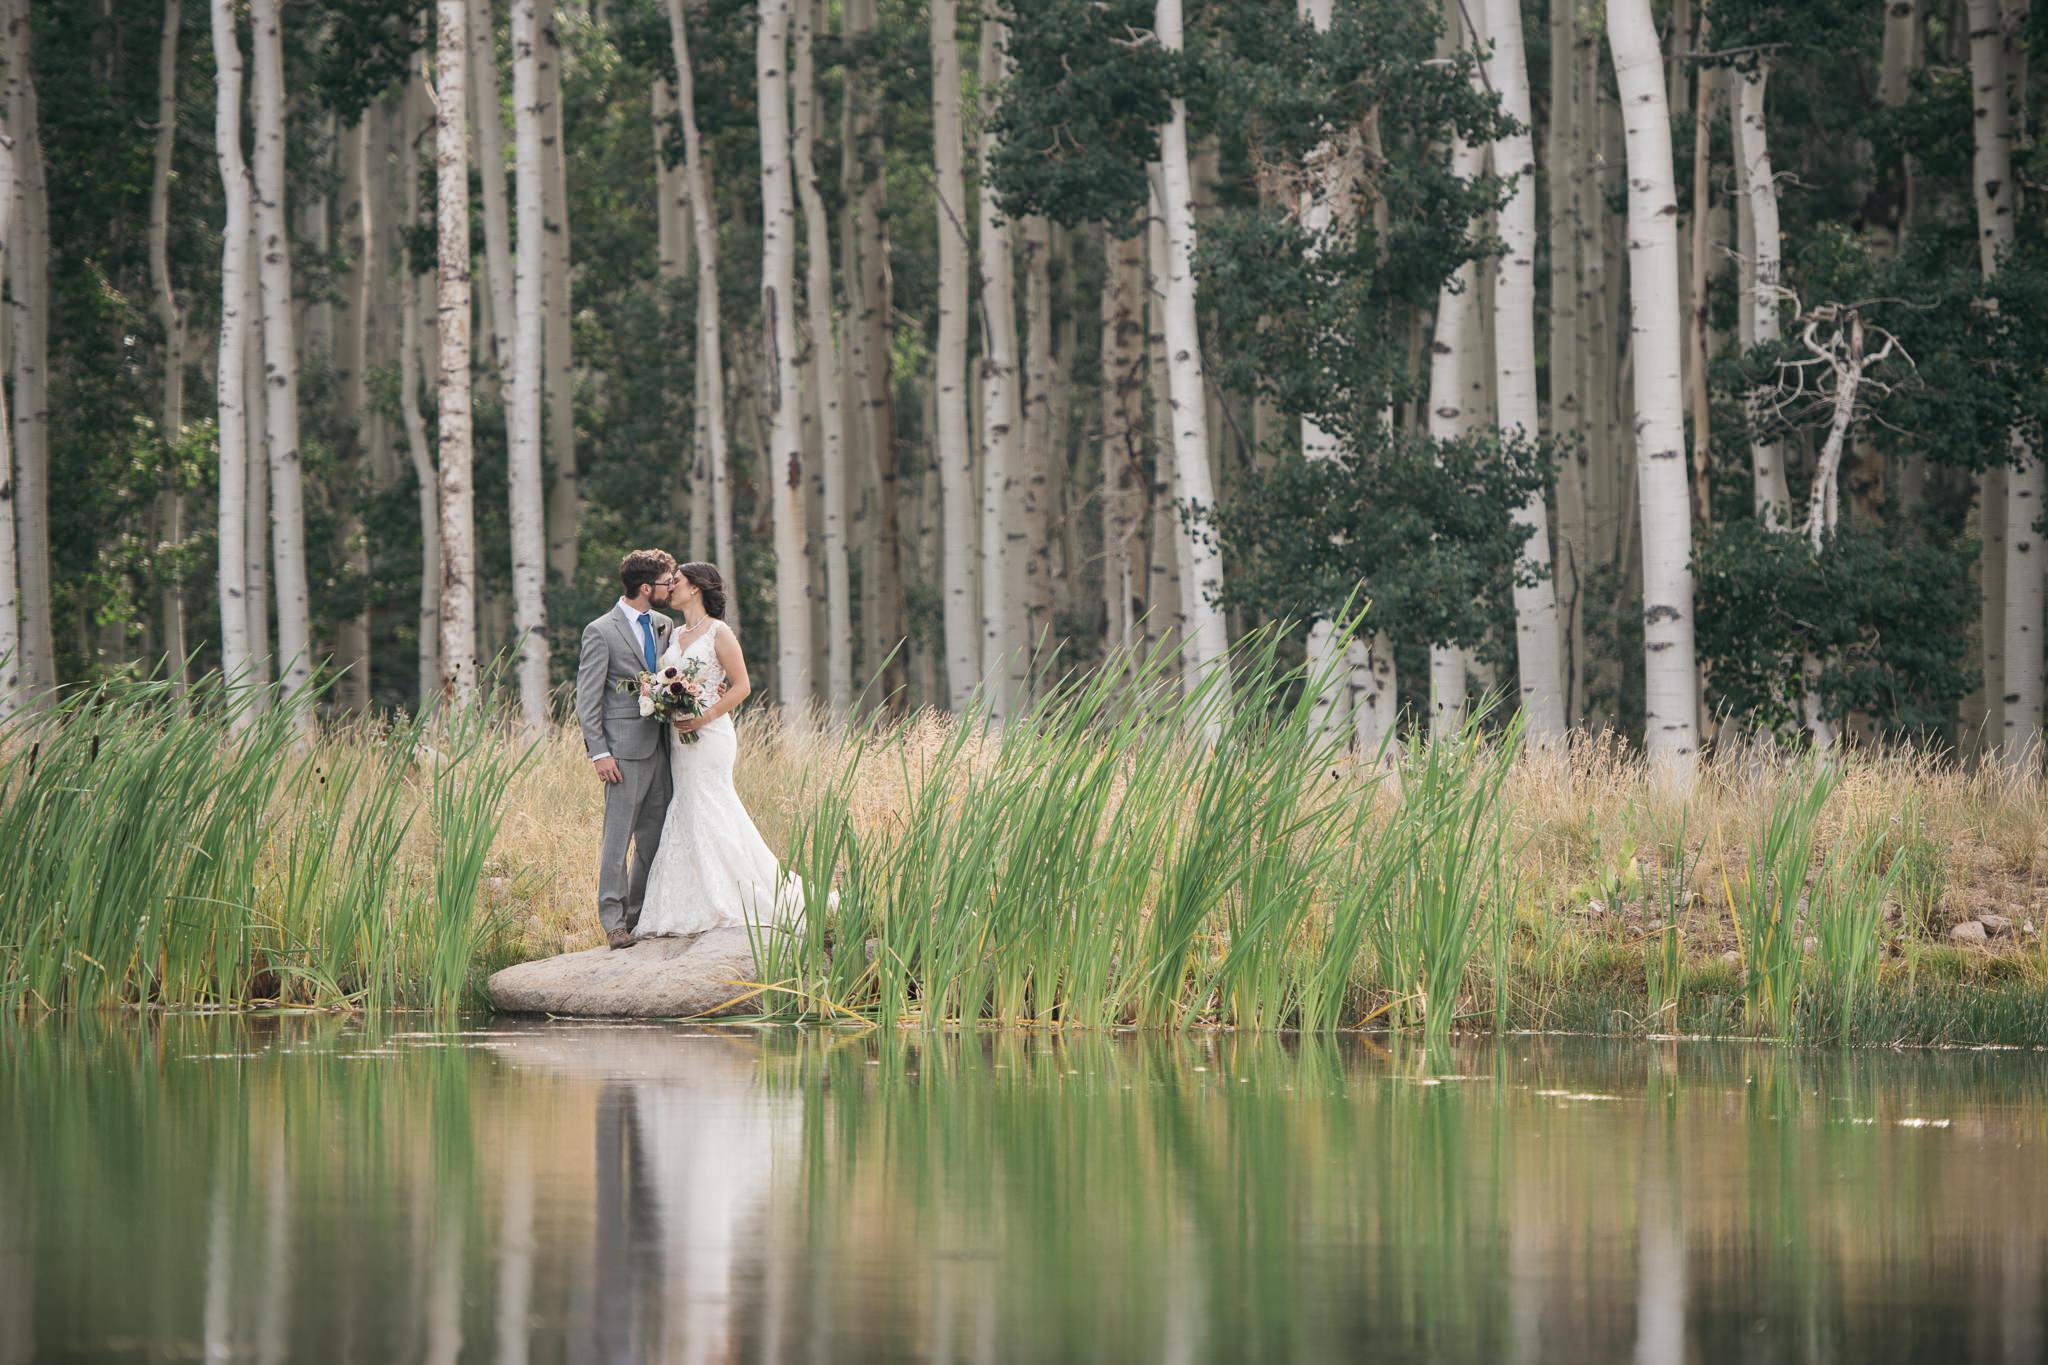 392_ONL_Kat_Nick_Wedding_Trevor_Hooper_Photo.jpg